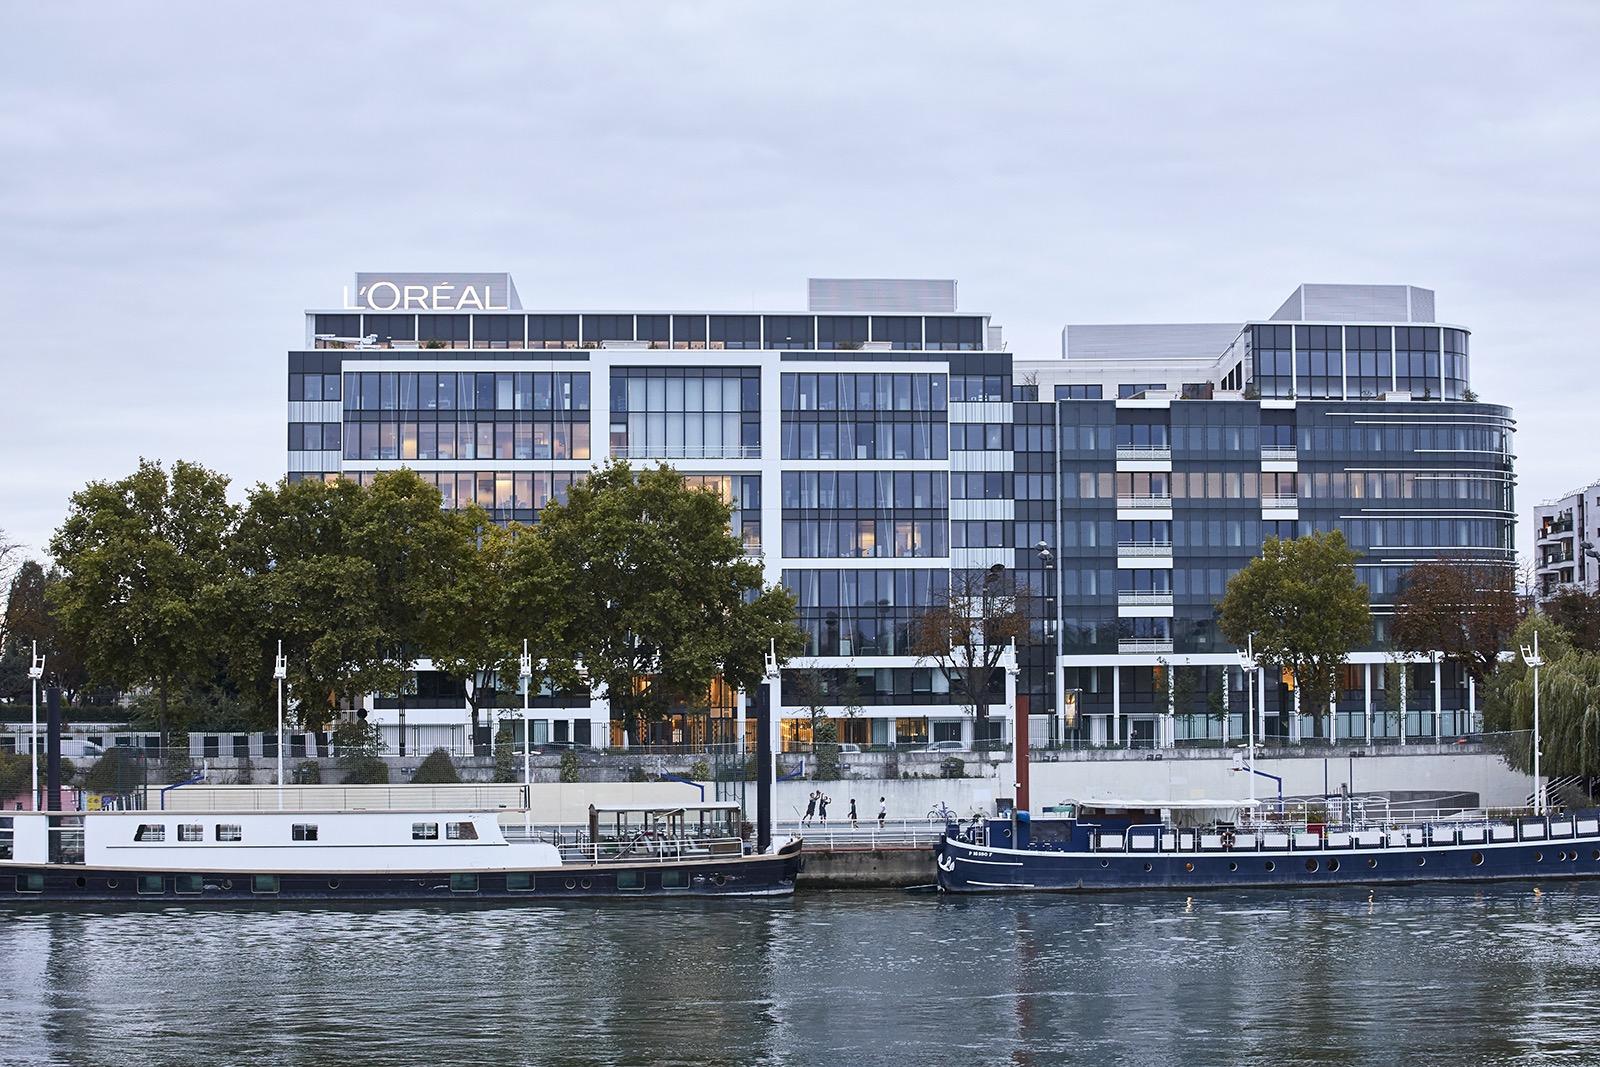 loreal-office-paris-20